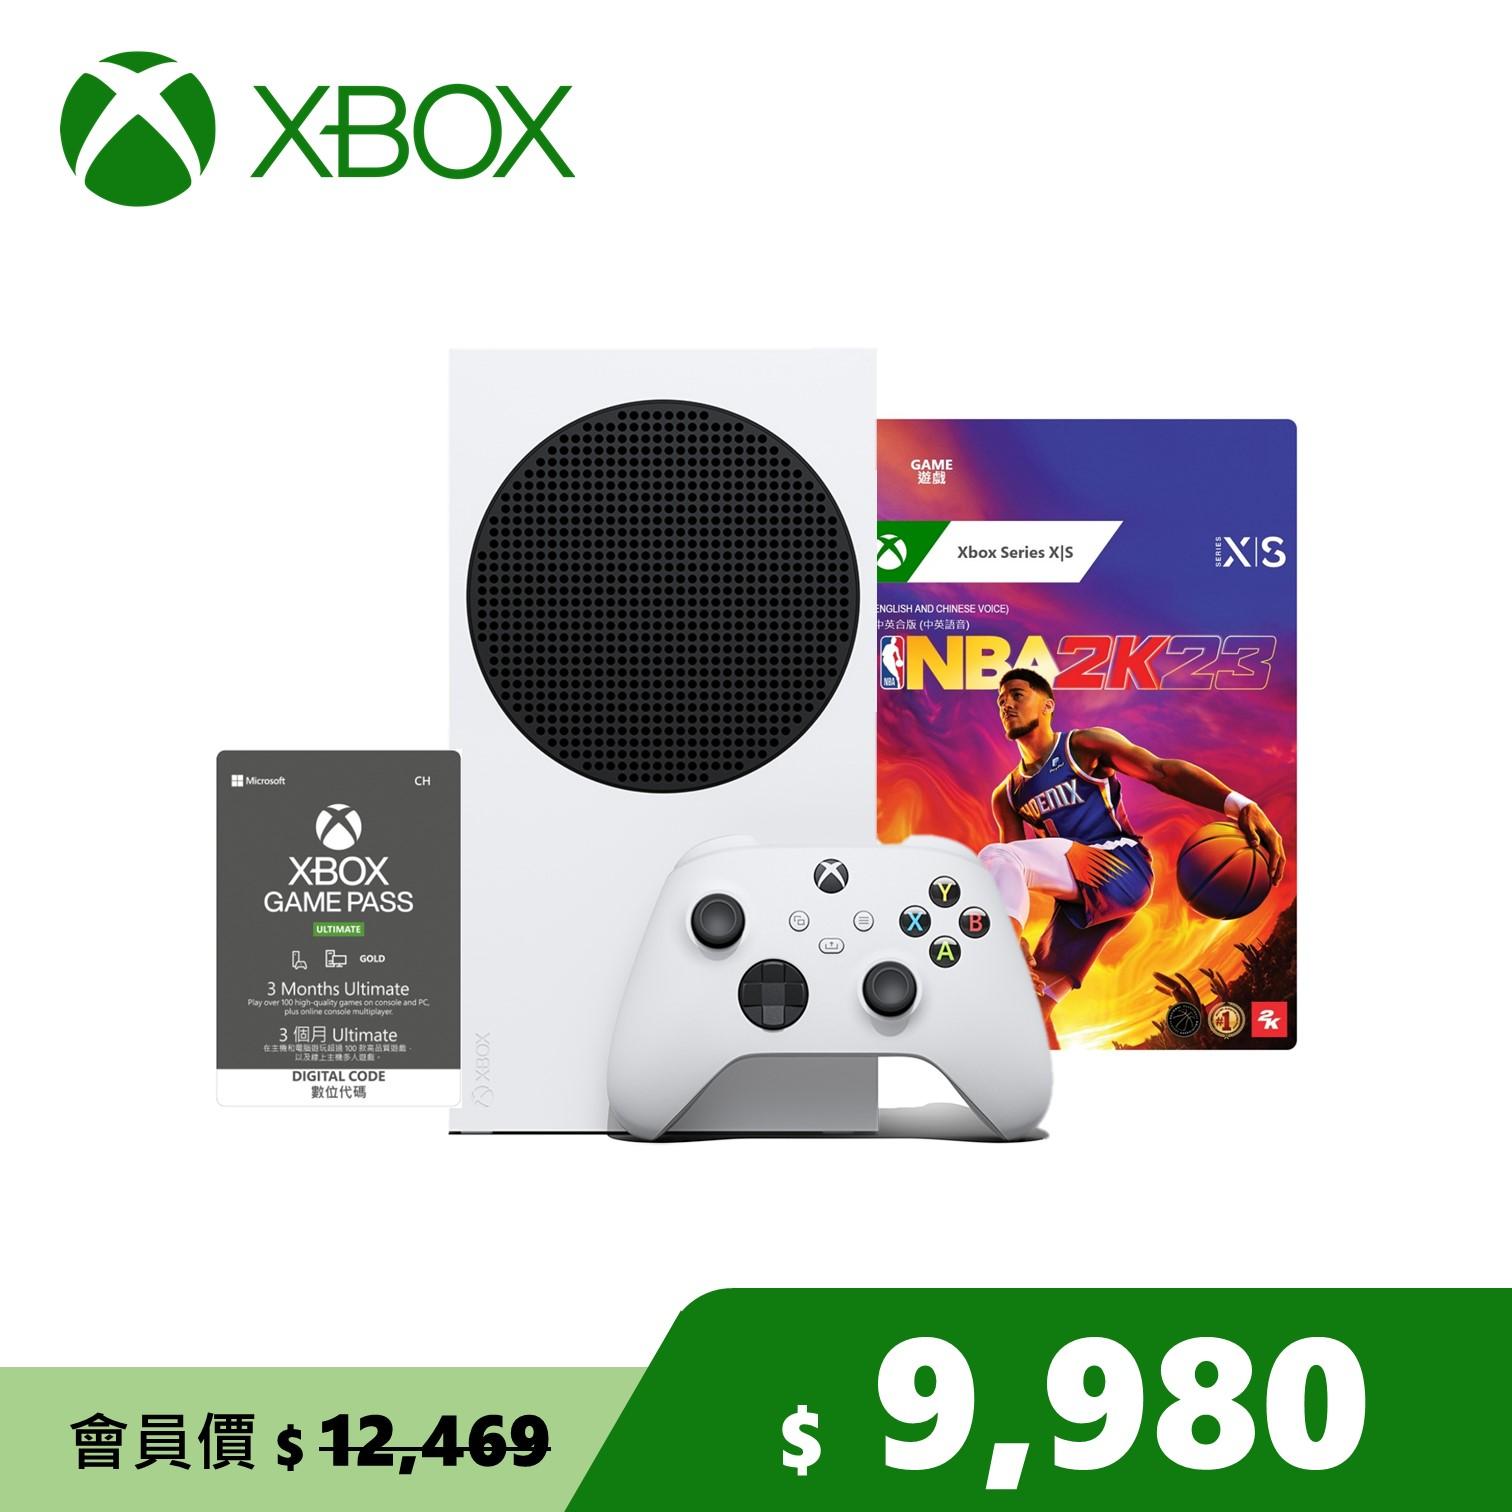 【618特惠組】Xbox Series S主機 + Xbox Game Pass Ultimate 3個月實體卡2張 RRS-00020